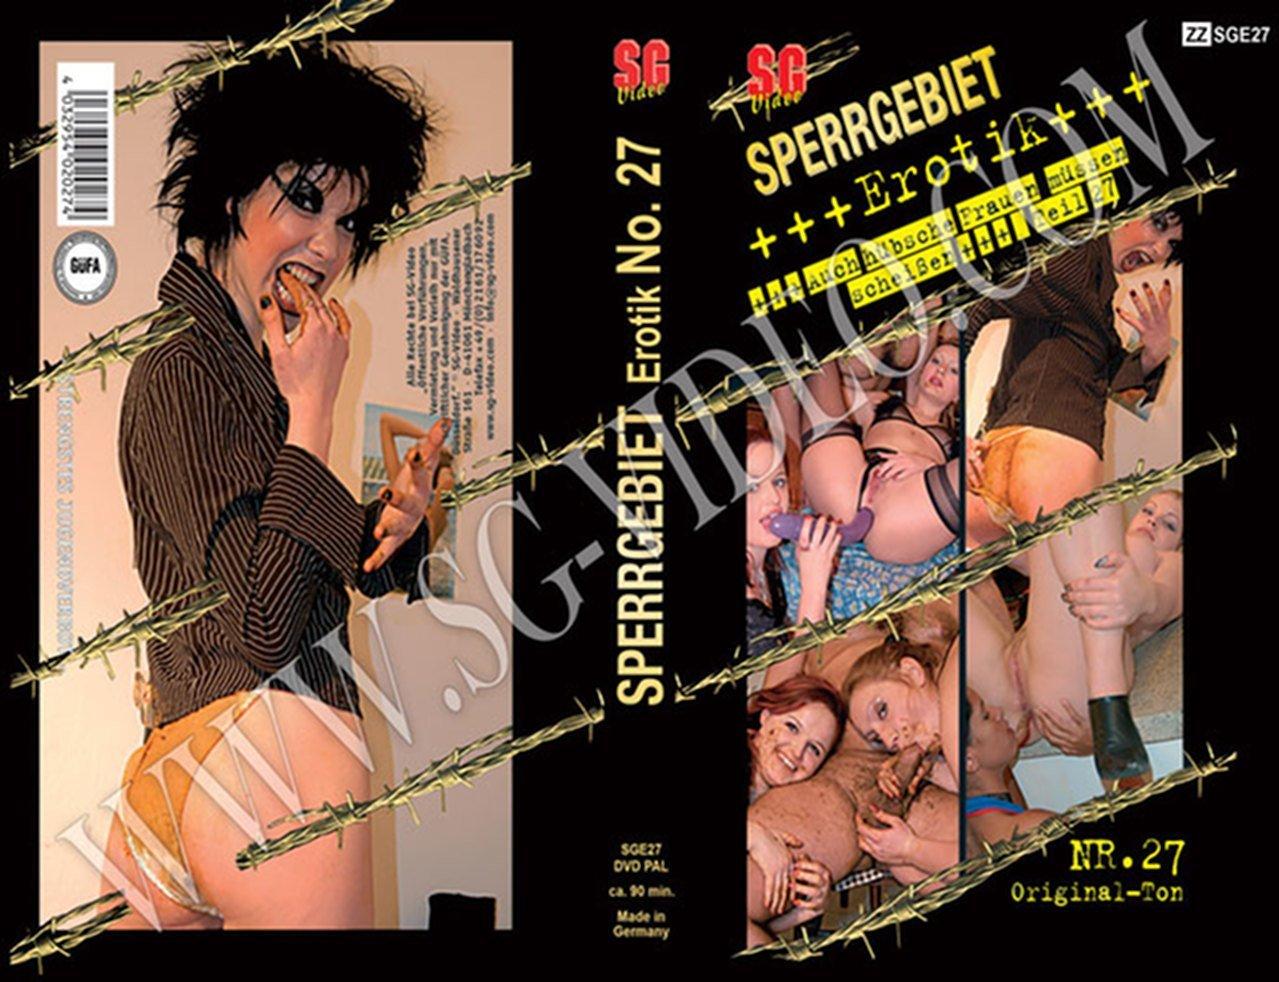 Sperrgebiet Erotik 27 - Scat Full Movie (Bjarka,Silvia, Tima and Roland)